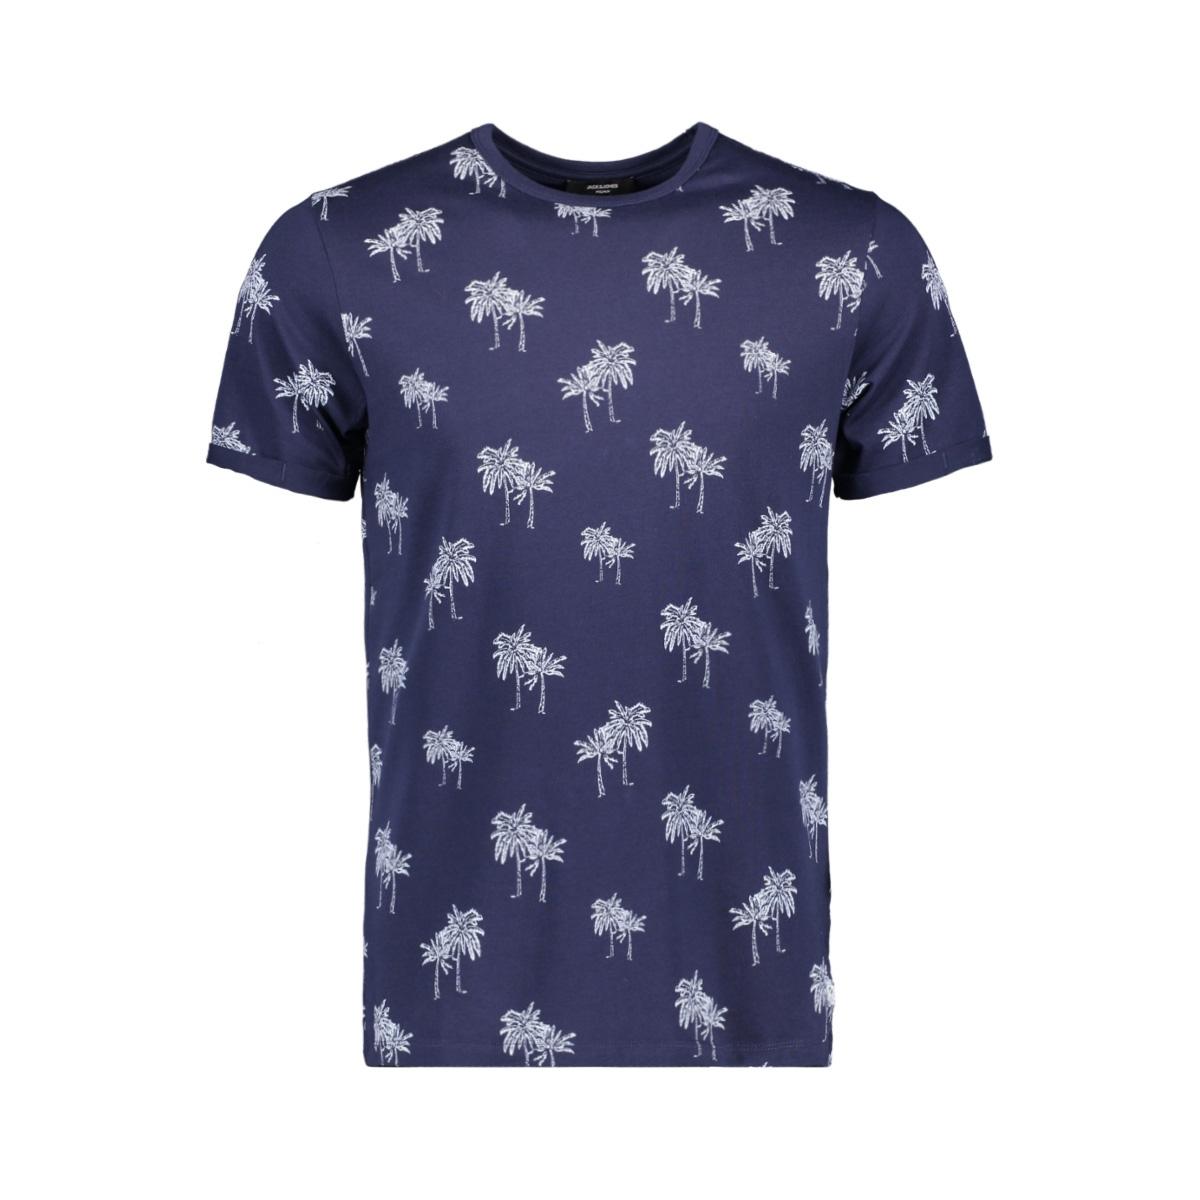 jprslam bla. tee ss crewneck 12153820 jack & jones t-shirt maritime blue/slim fit